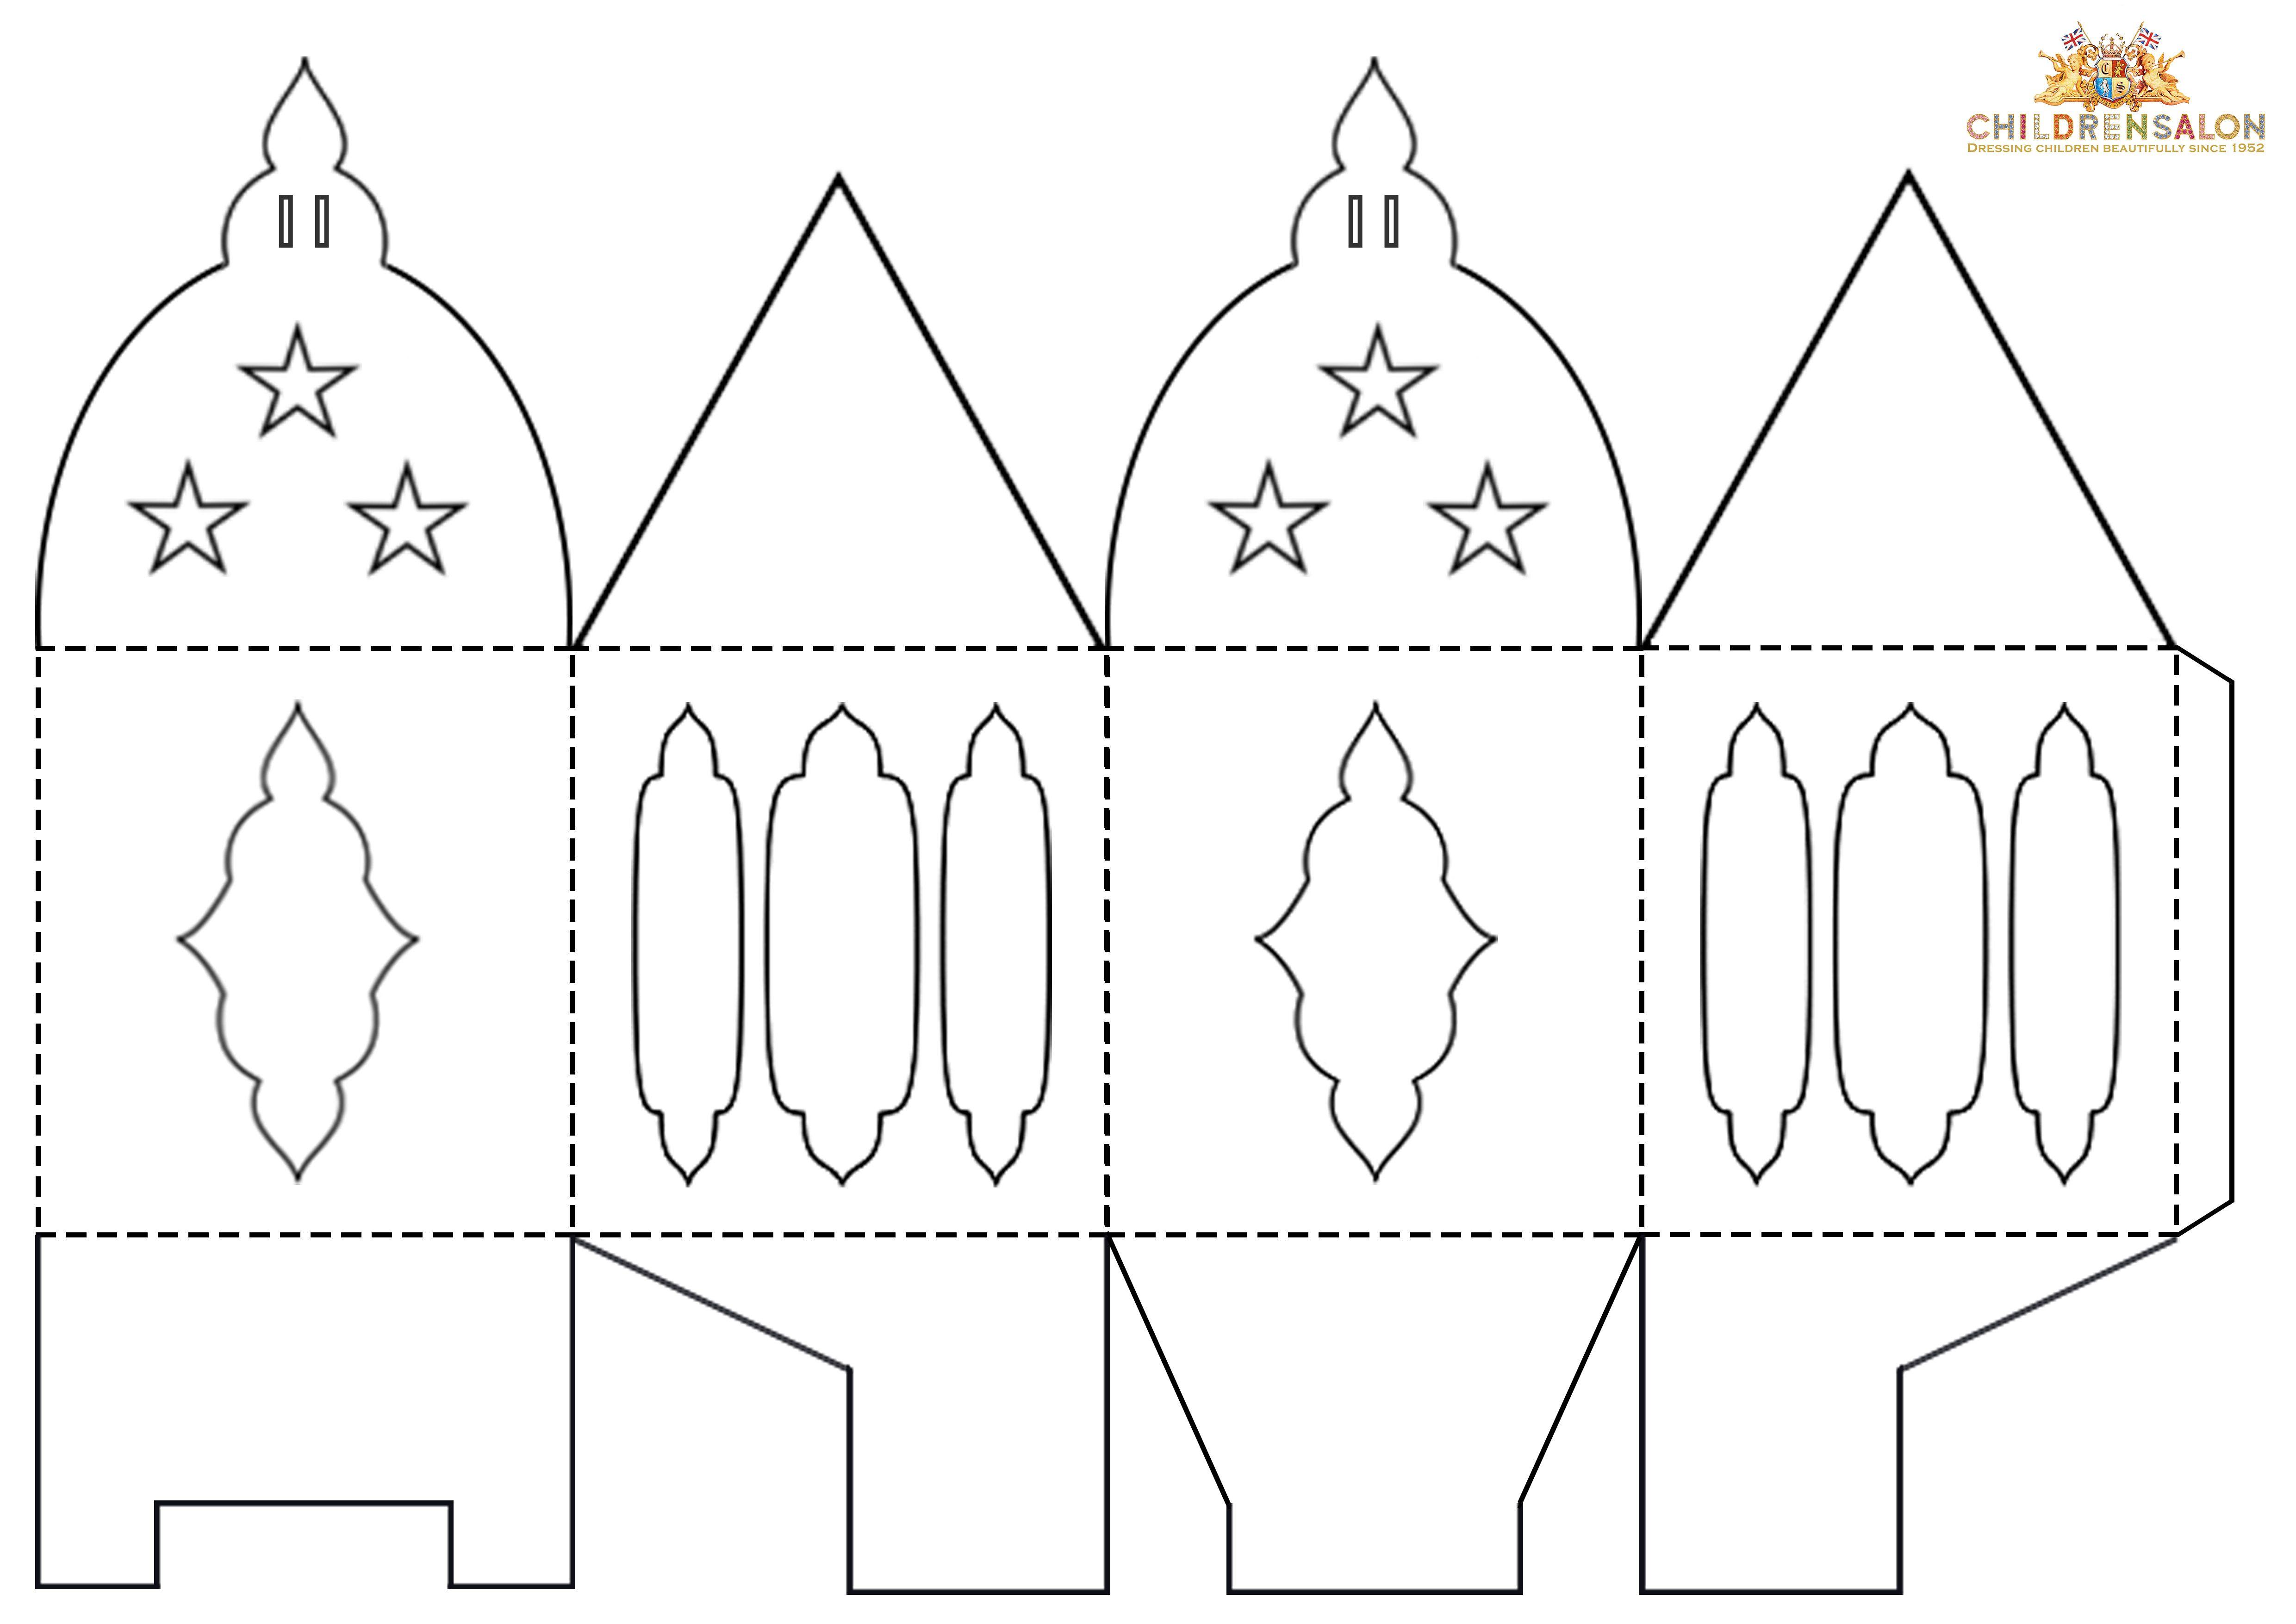 Eid Gift Box Template Childrensalon Jpg 4 961 3 508 Pixels Paper